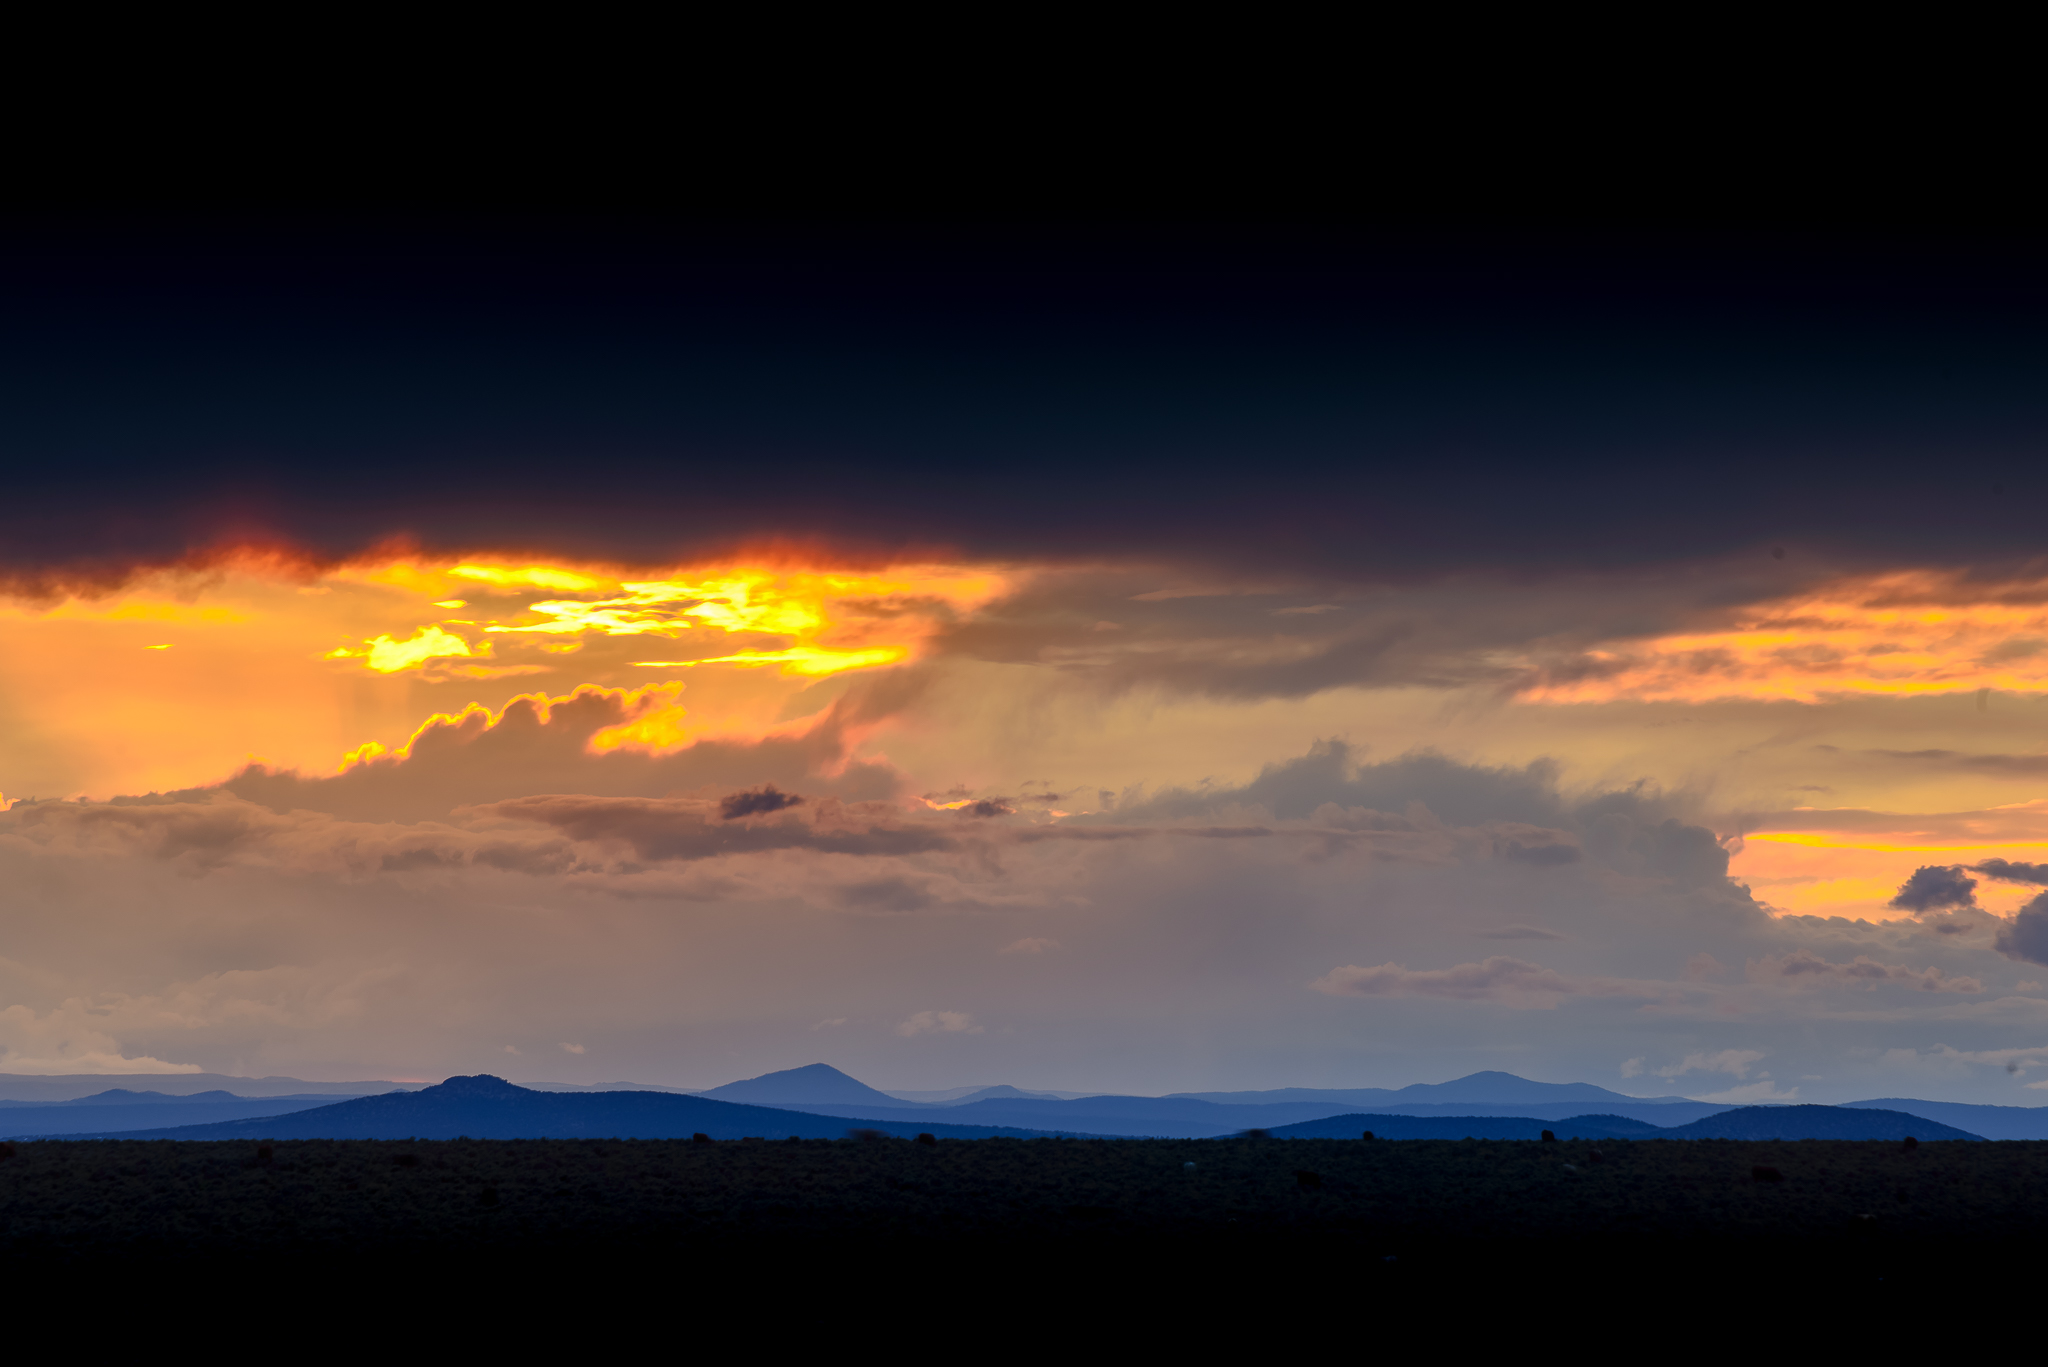 taos_open_field_sunset_black_bars